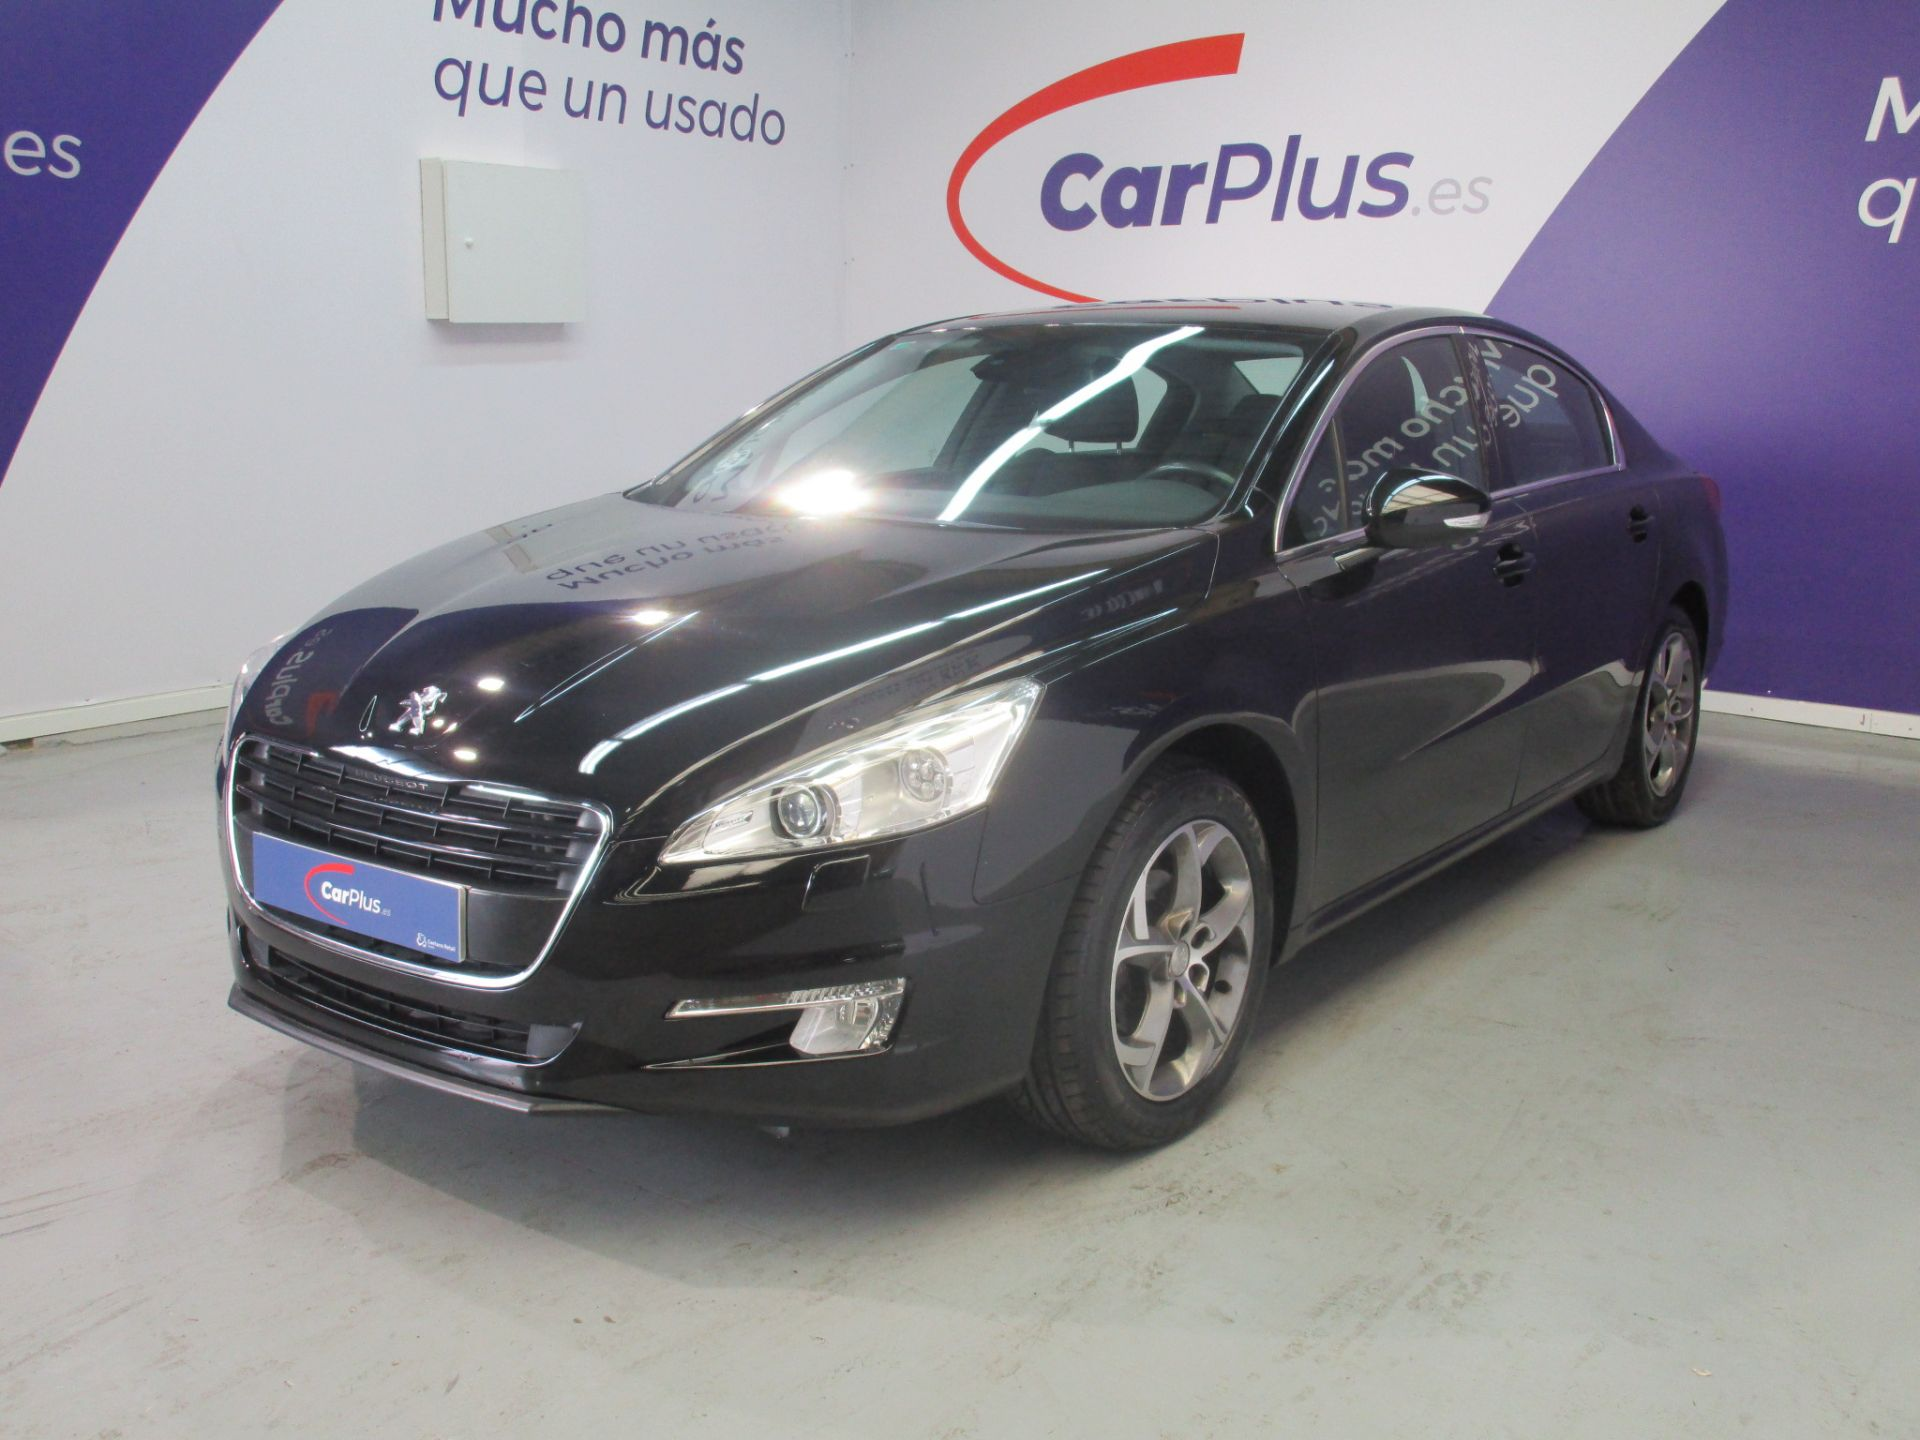 Peugeot 508 Style 2.0 HDI 140cv segunda mano Madrid